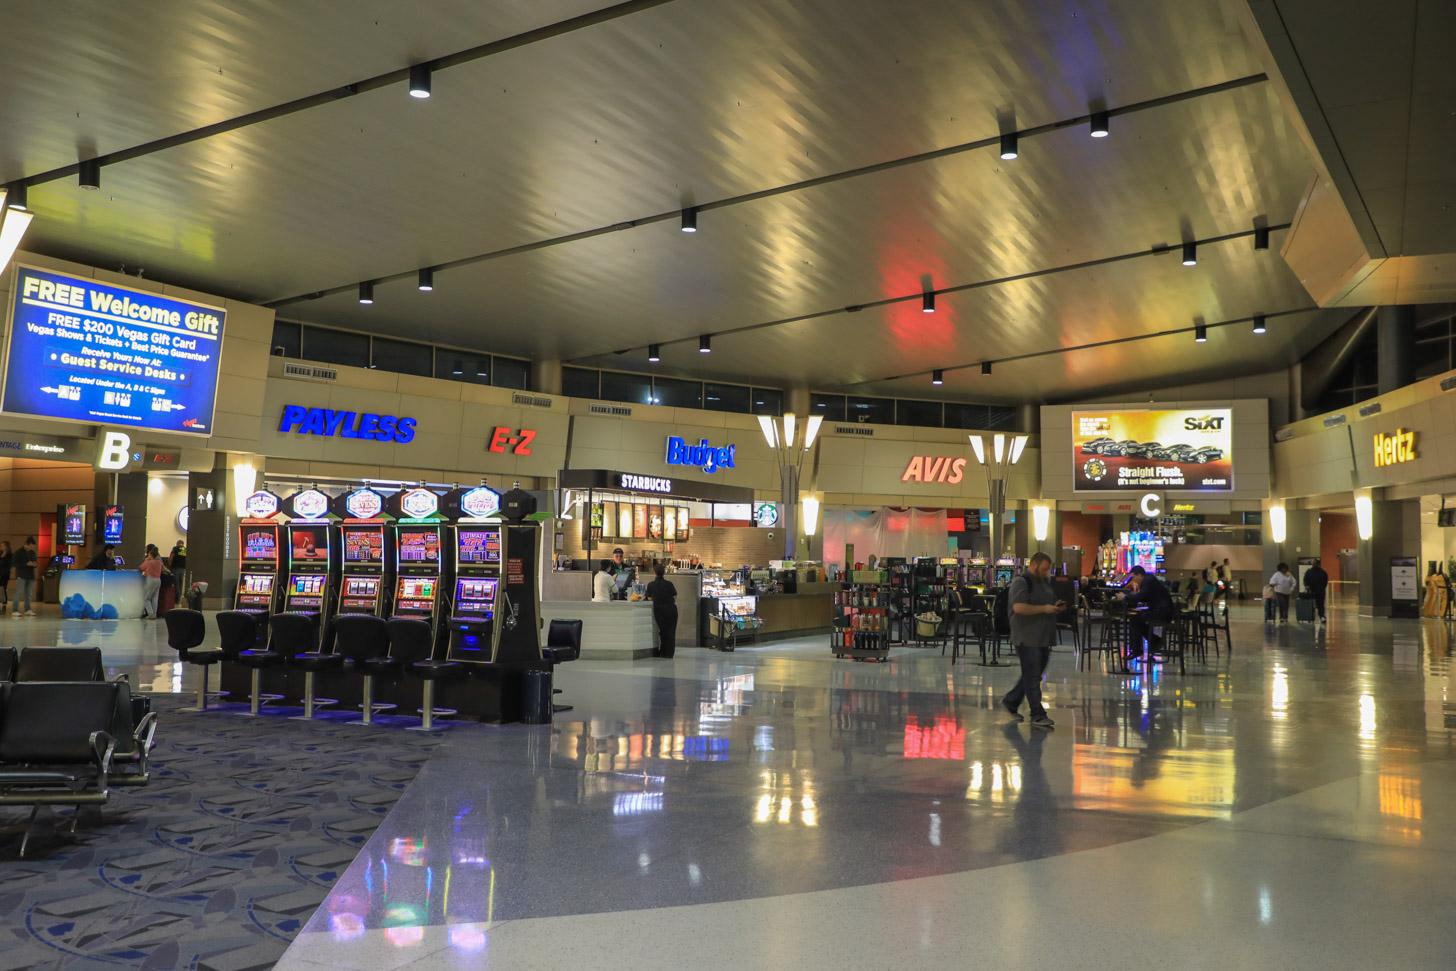 huurauto's in Las Vegas